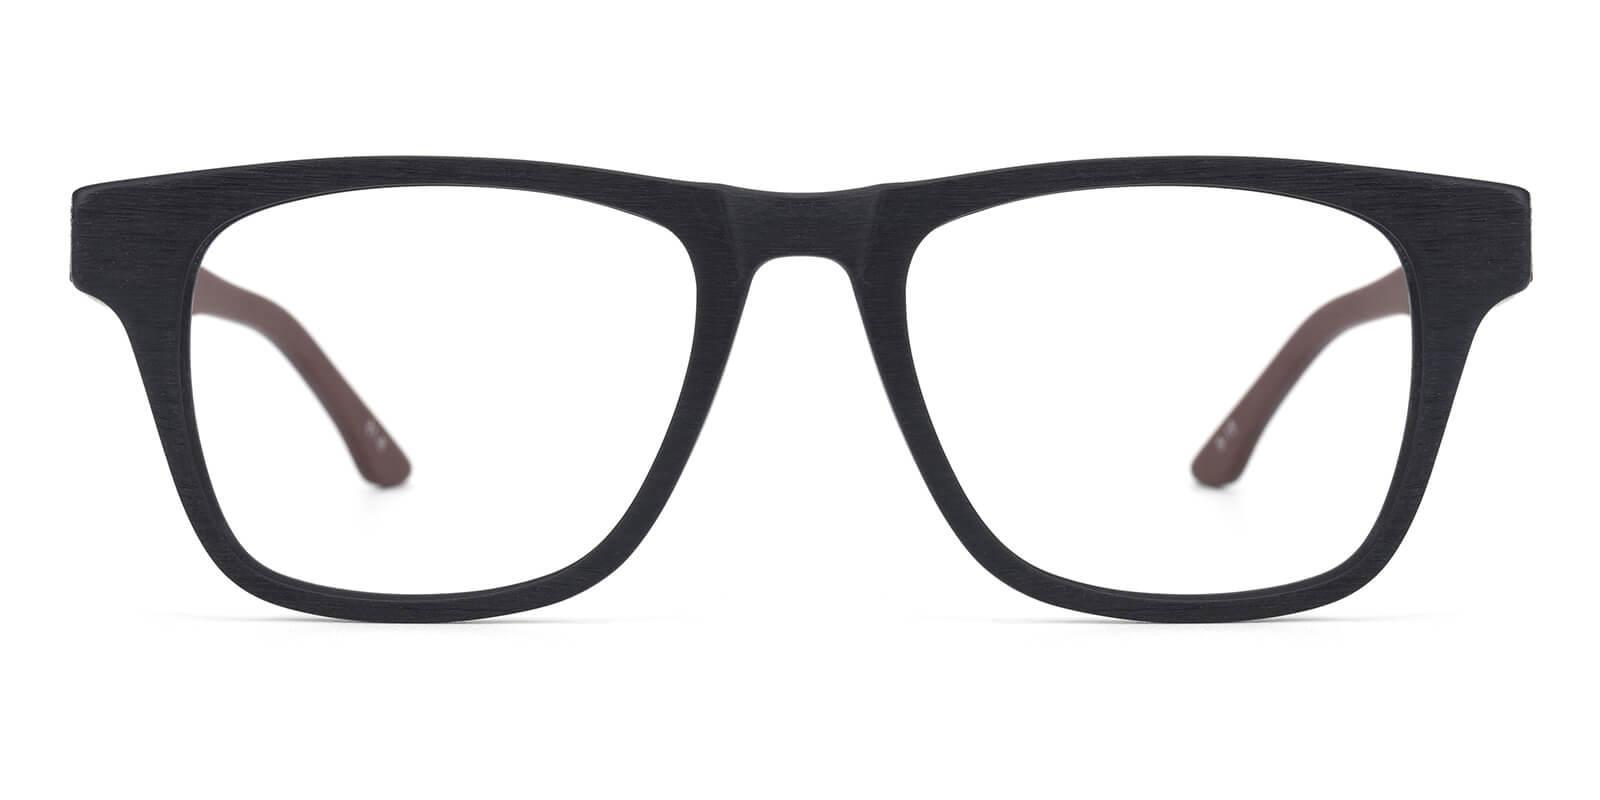 Nashive-Brown-Rectangle-Acetate-Eyeglasses-additional2